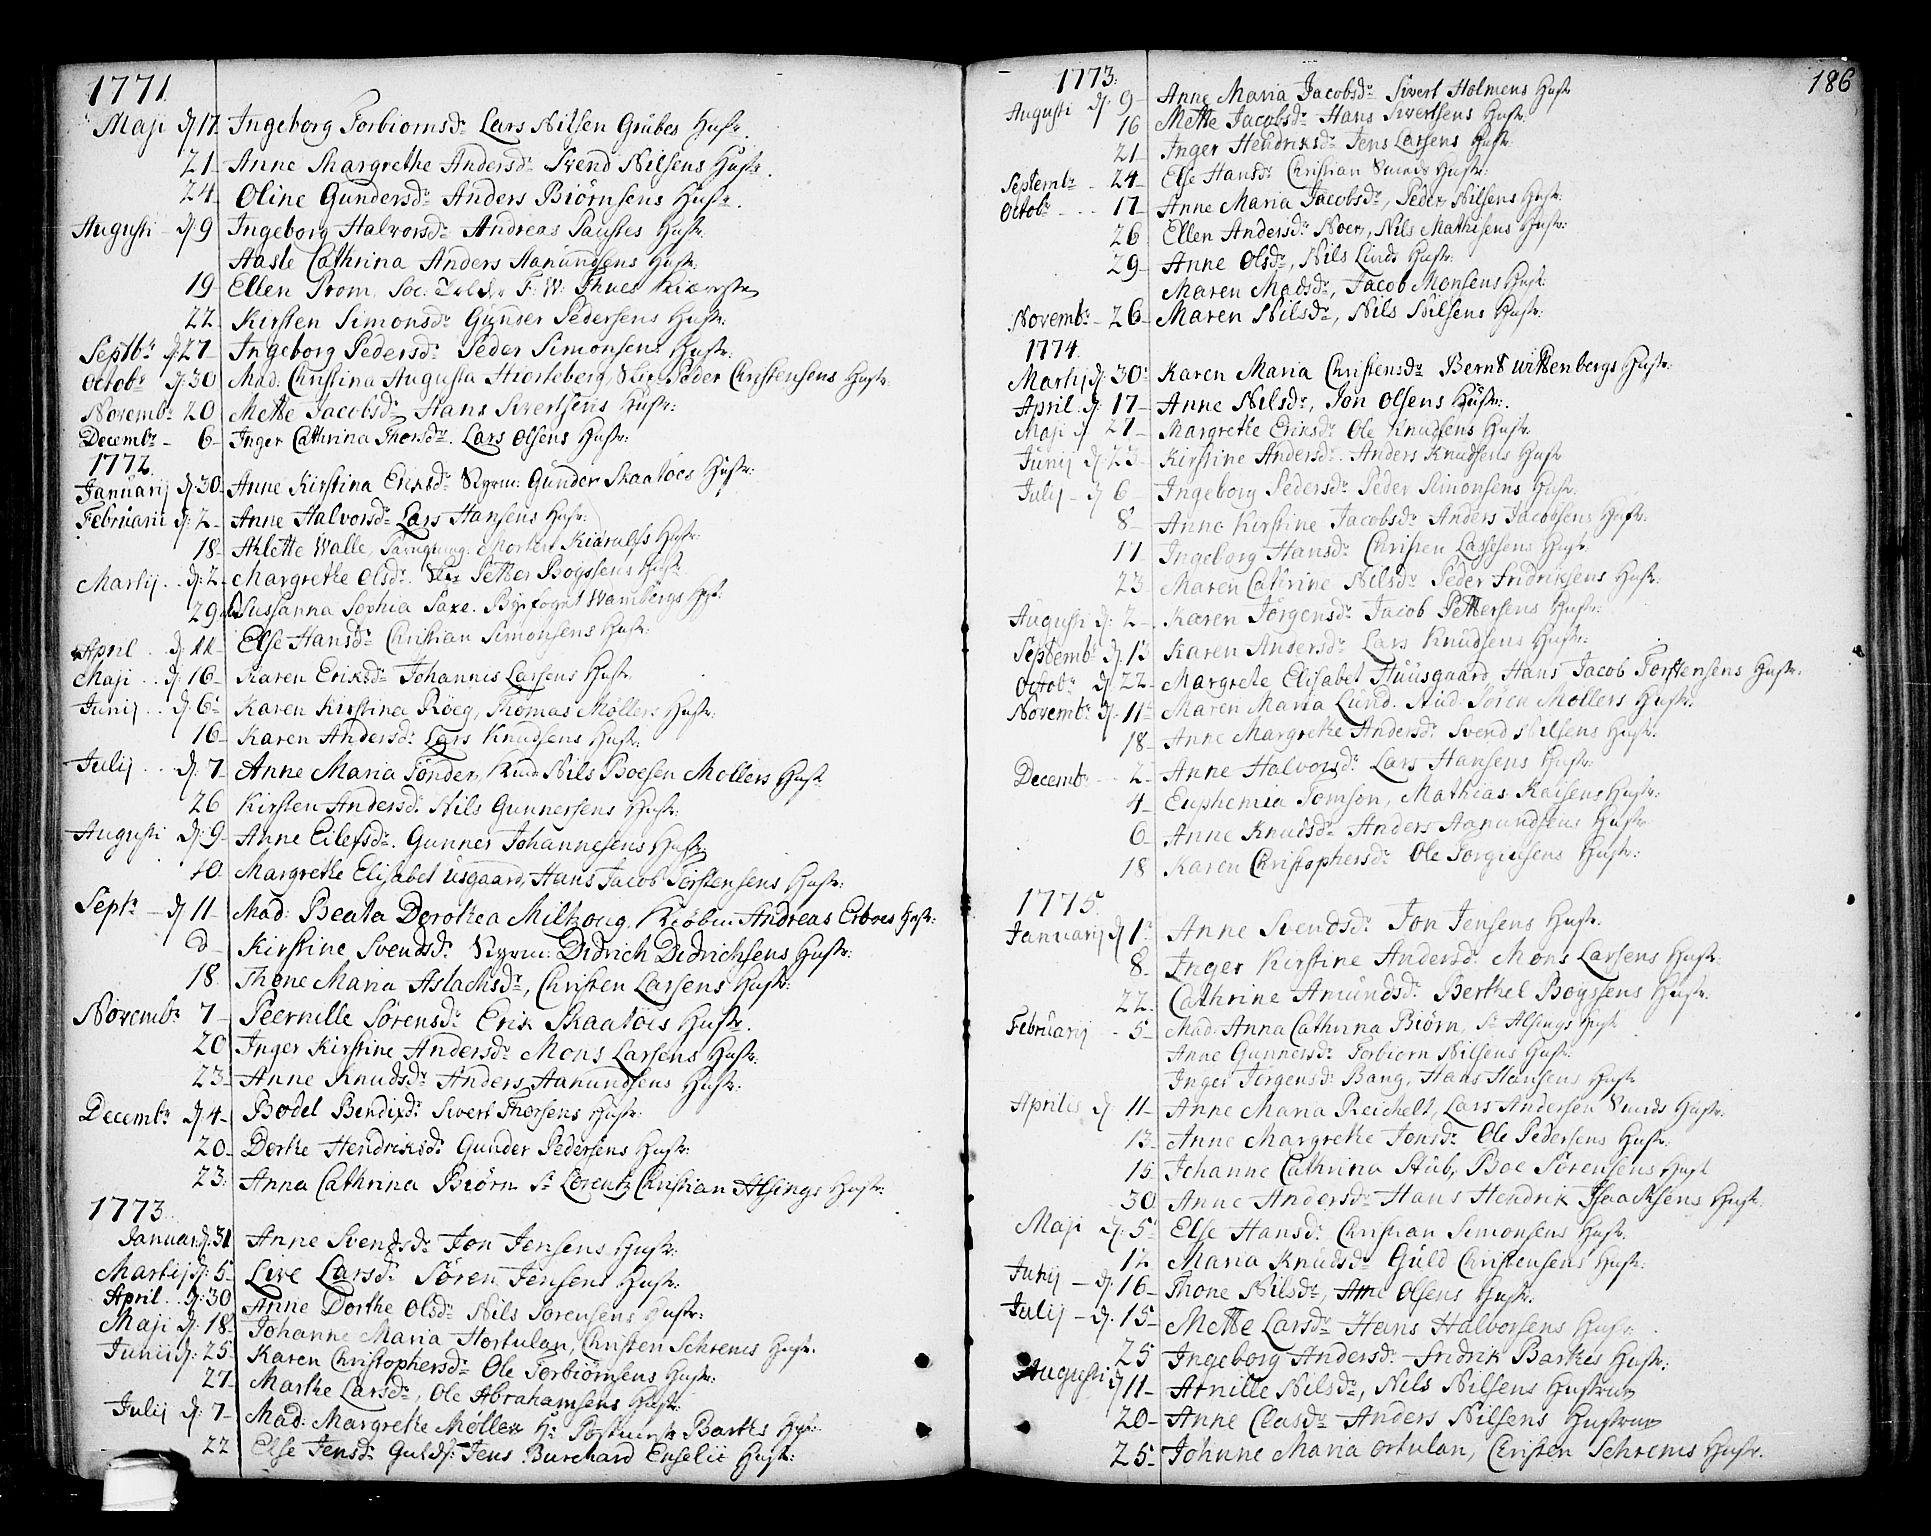 SAKO, Kragerø kirkebøker, F/Fa/L0002: Ministerialbok nr. 2, 1767-1802, s. 186